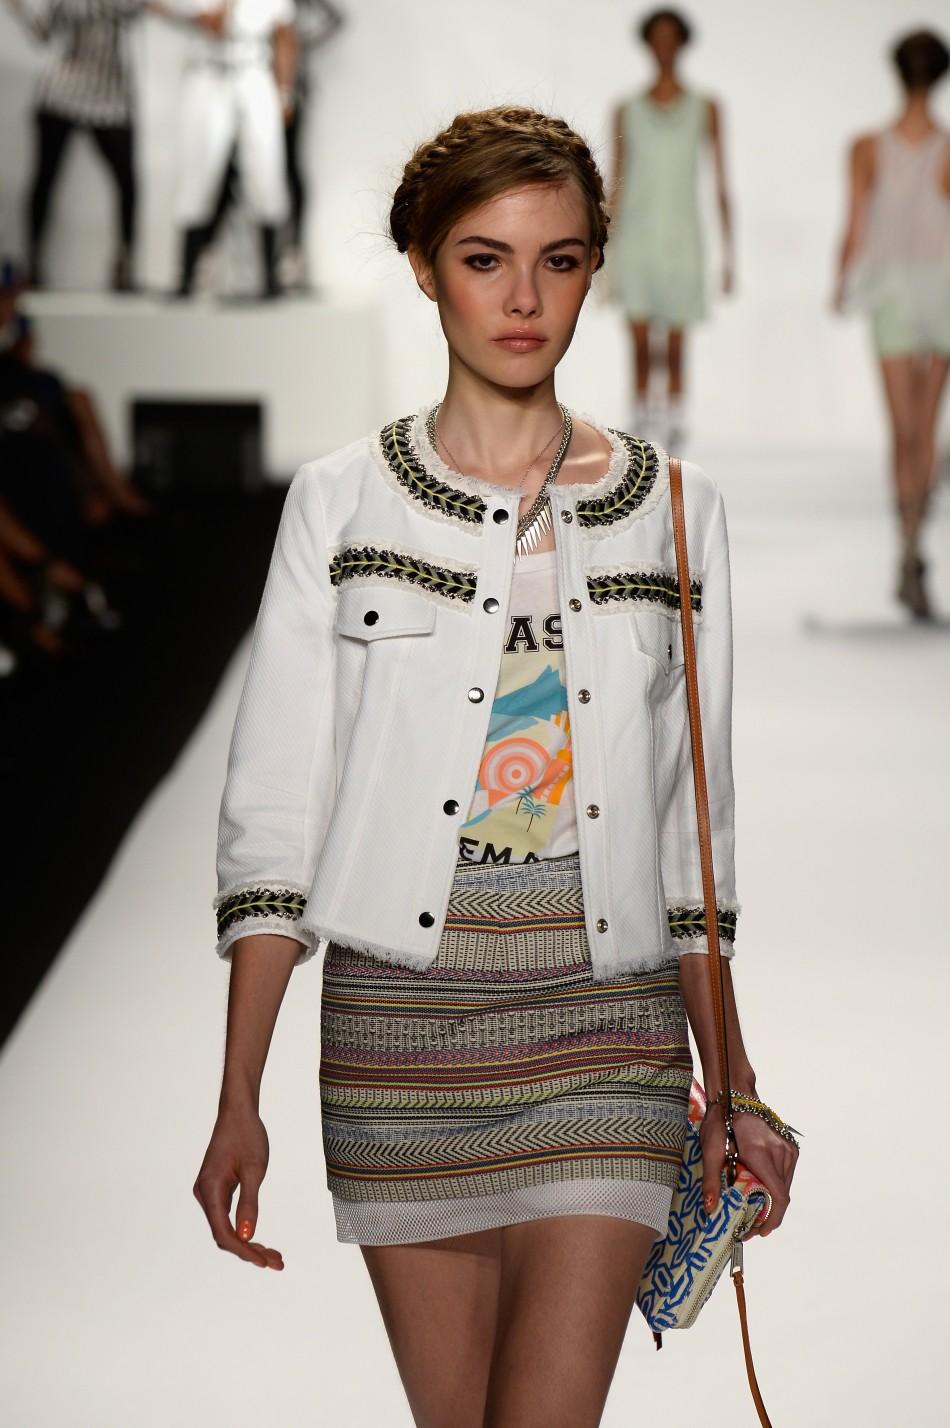 20590-rebecca-minkoff-spring-2014-new-york-fashion-week.jpg